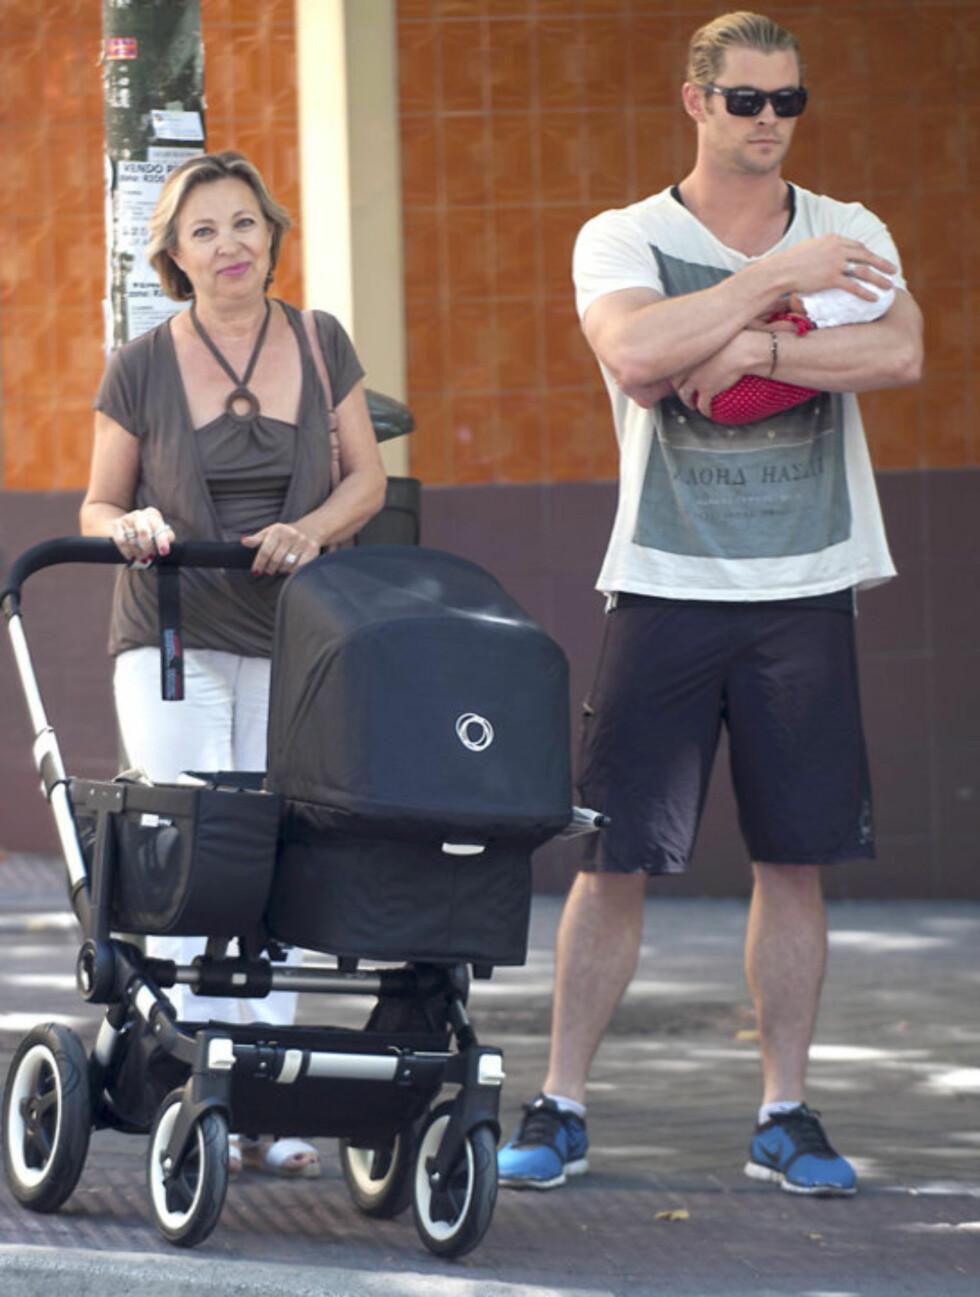 FAMILIETUR: Også Chris Hemsworths svigermor, Cristina Medianu, var med på spaserturen. Hun måtte tilsynelatende nøye seg med å trille tom vogn mens filmstjernen holdt godt på datteren sin.  Foto: © GTRESONLINE